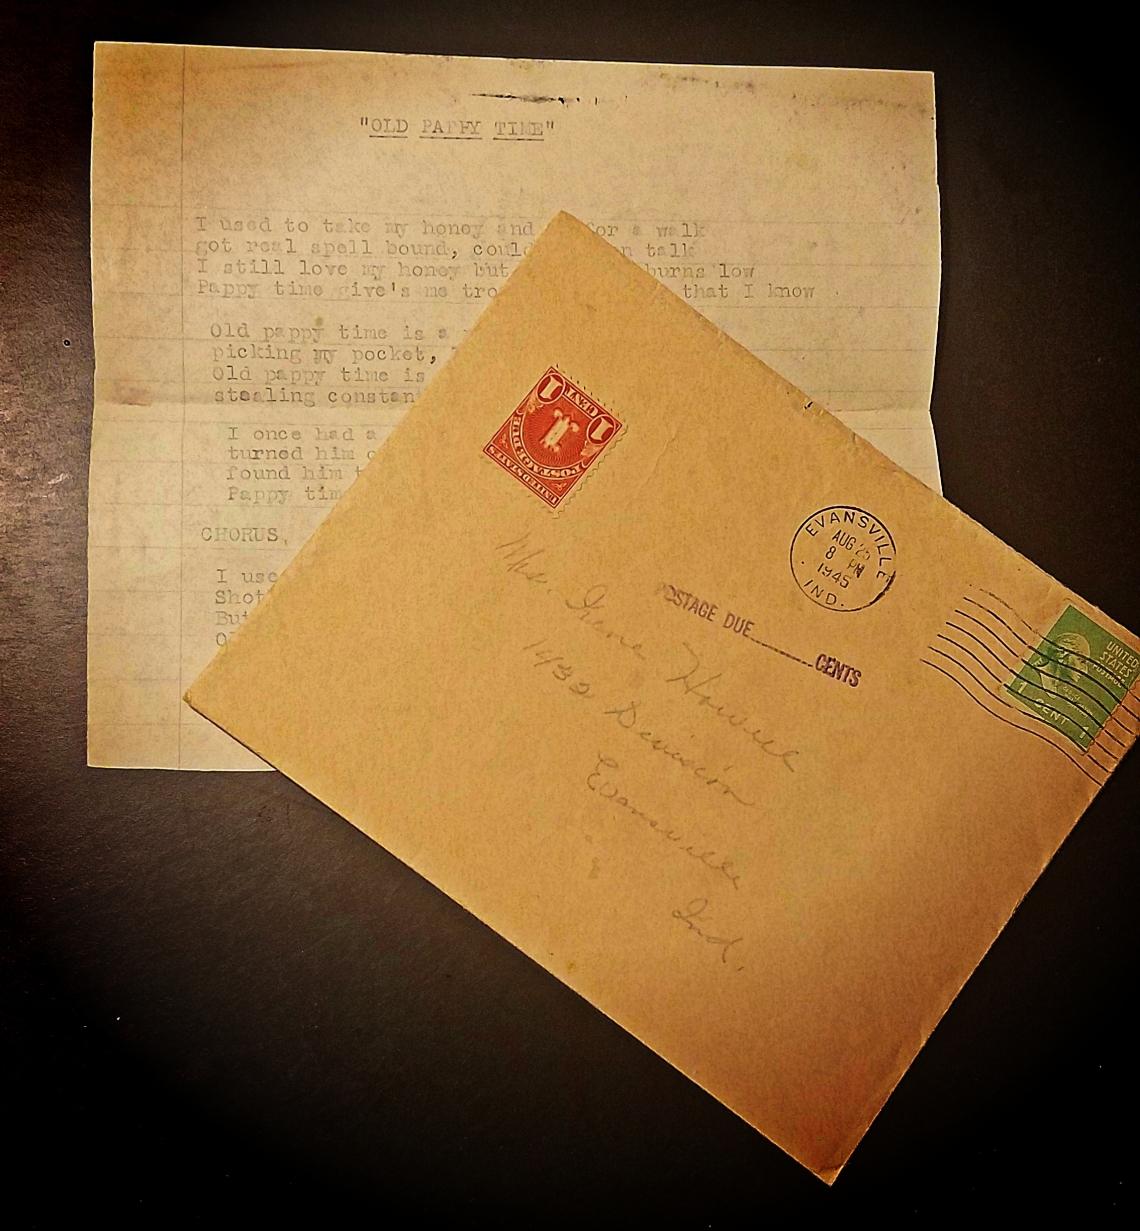 00-1945-envelope-2017-11-12_09-16-A